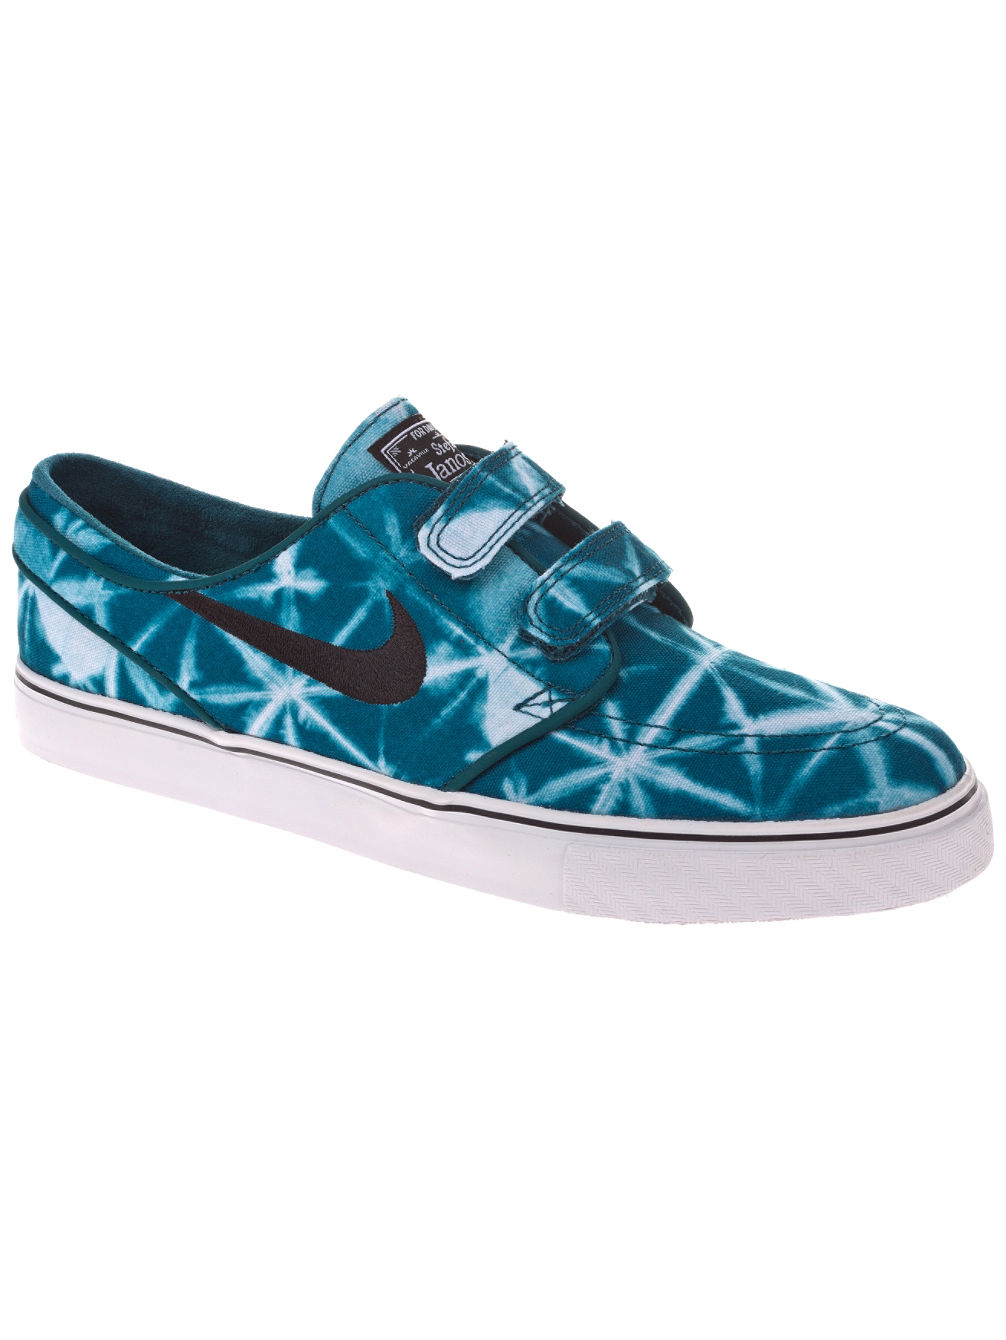 Nike Zoom Stefan Janoski AC Sneakers - nike - blue-tomato.com